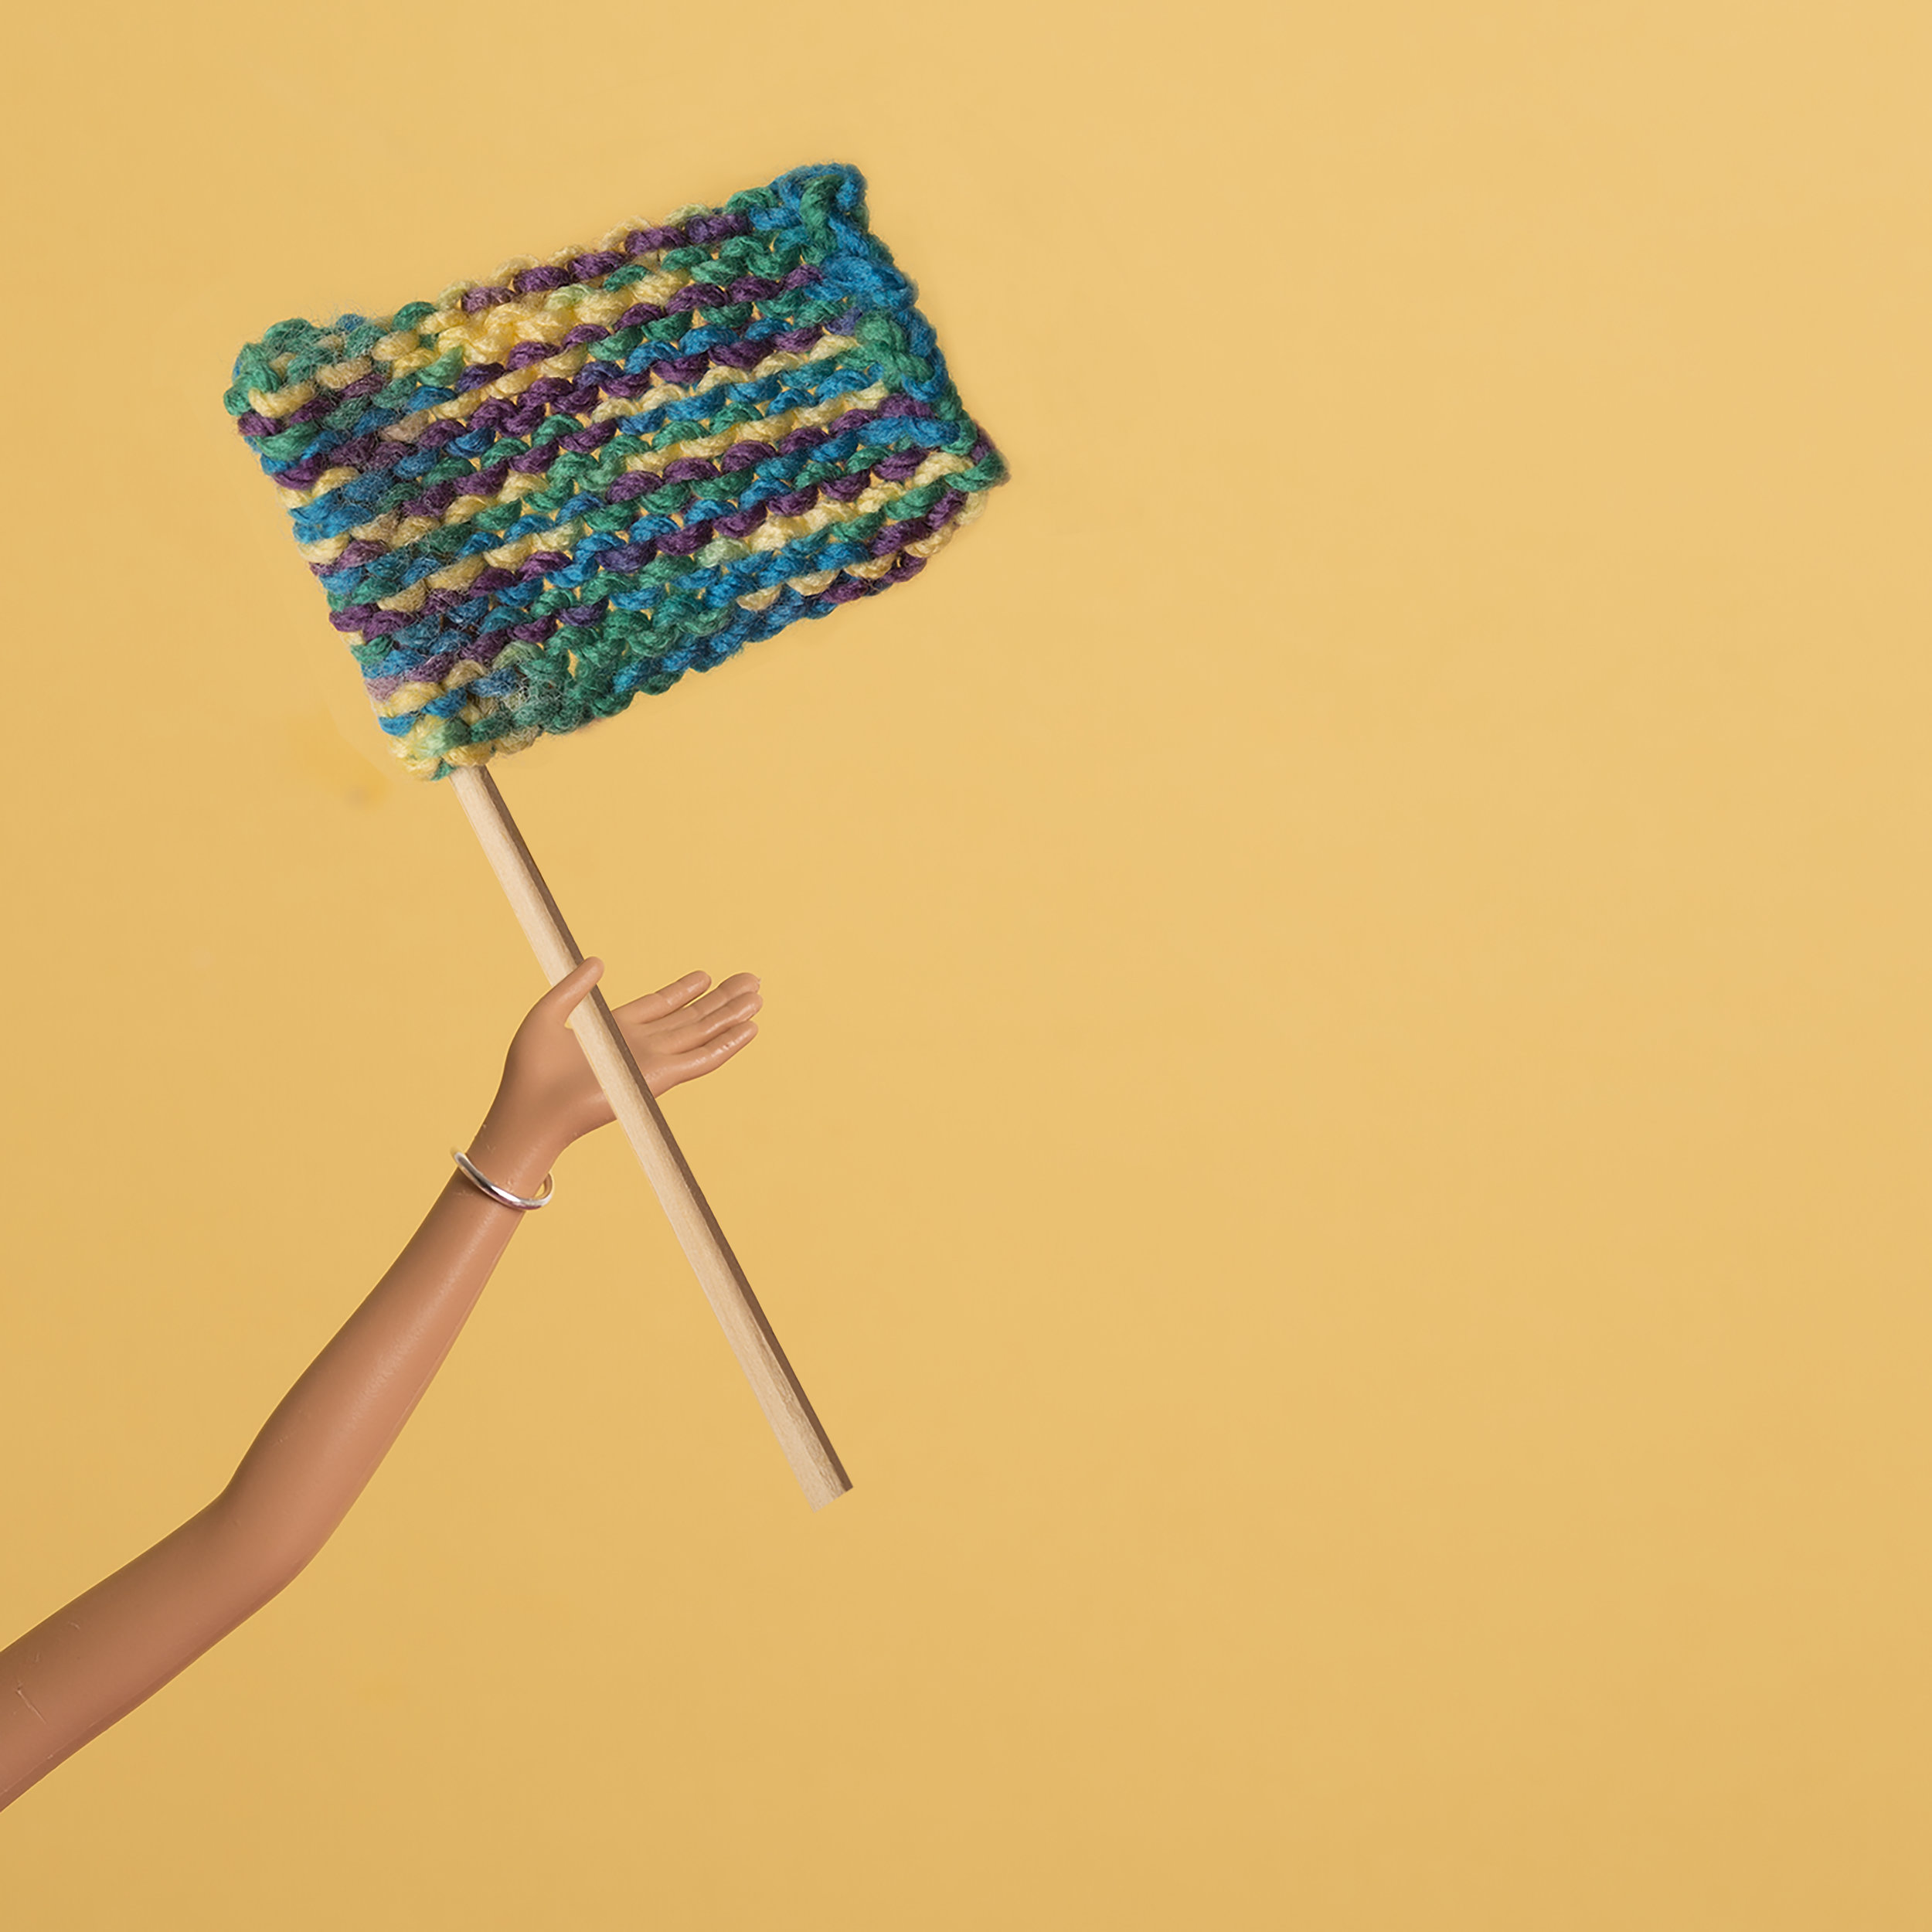 June 9th - Knit in Public Day